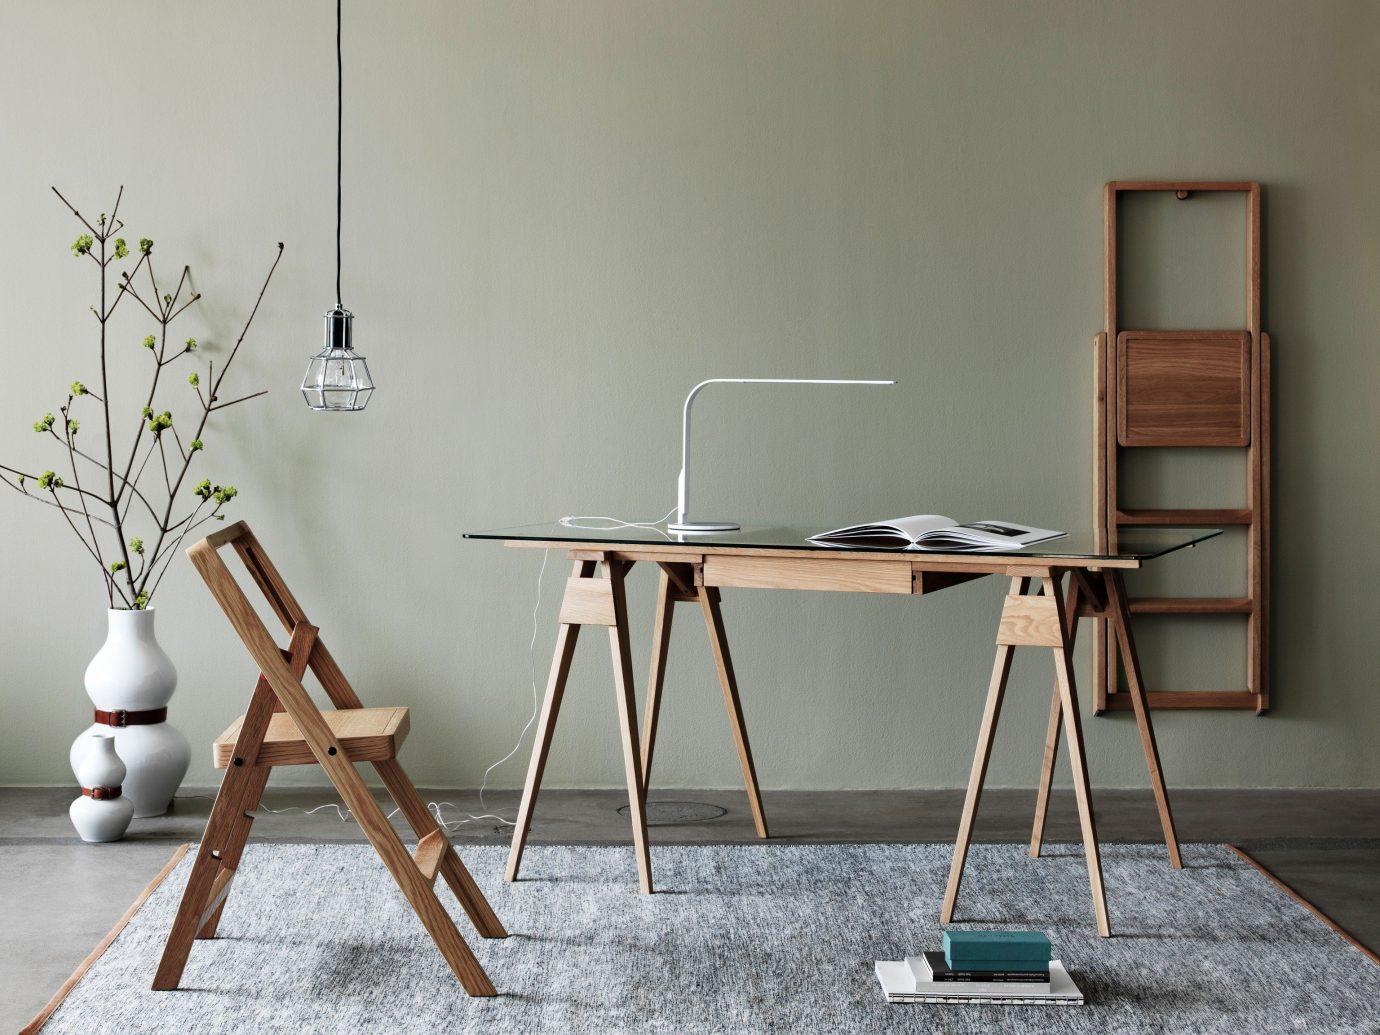 Jetsetter Guides wall indoor chair furniture room desk table floor wood interior design dining room Design